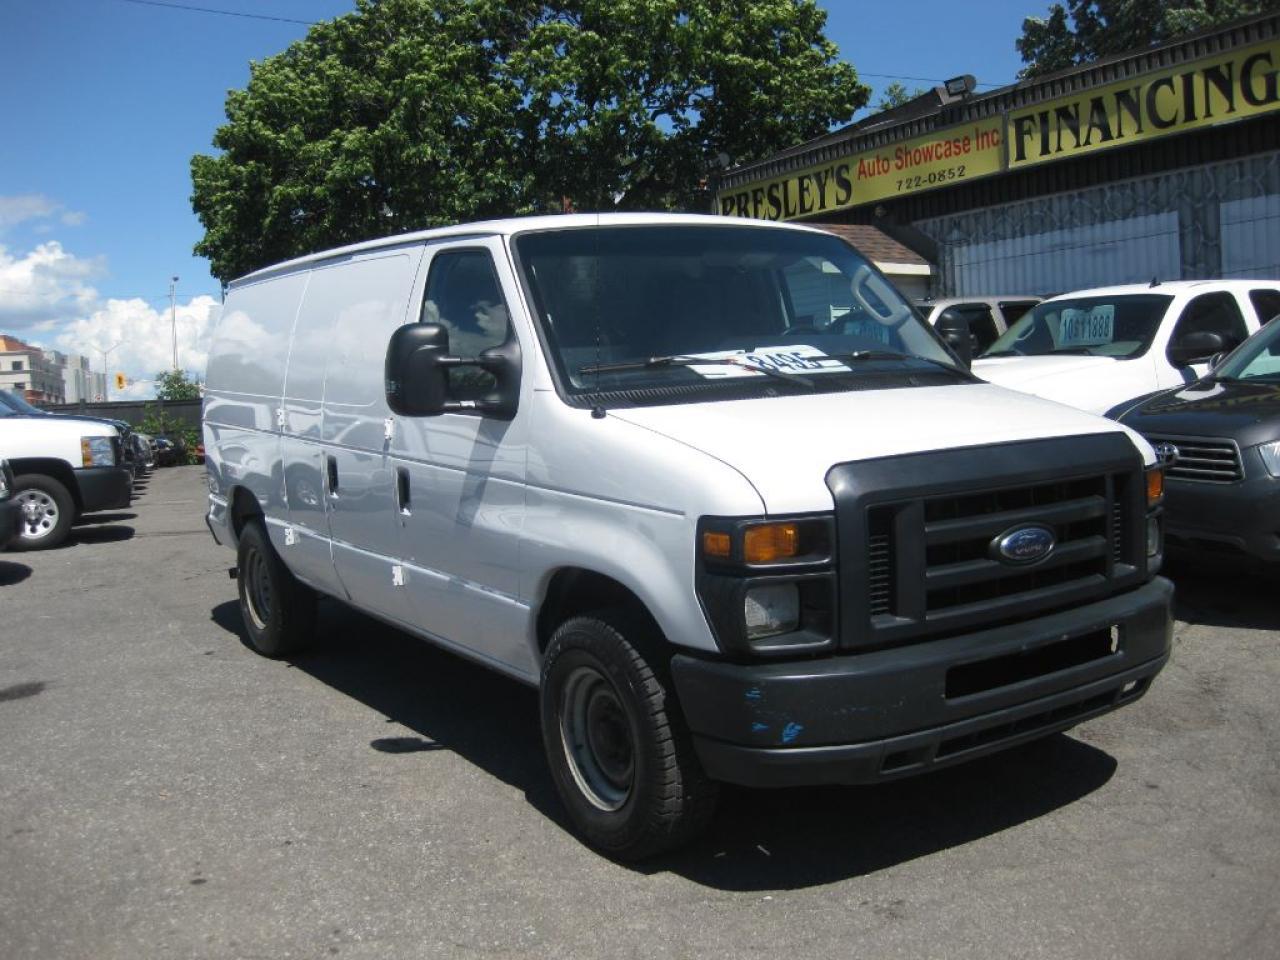 2011 Ford E-250 Econoline Cargo Van A/C 8-cyl. partition & shelves